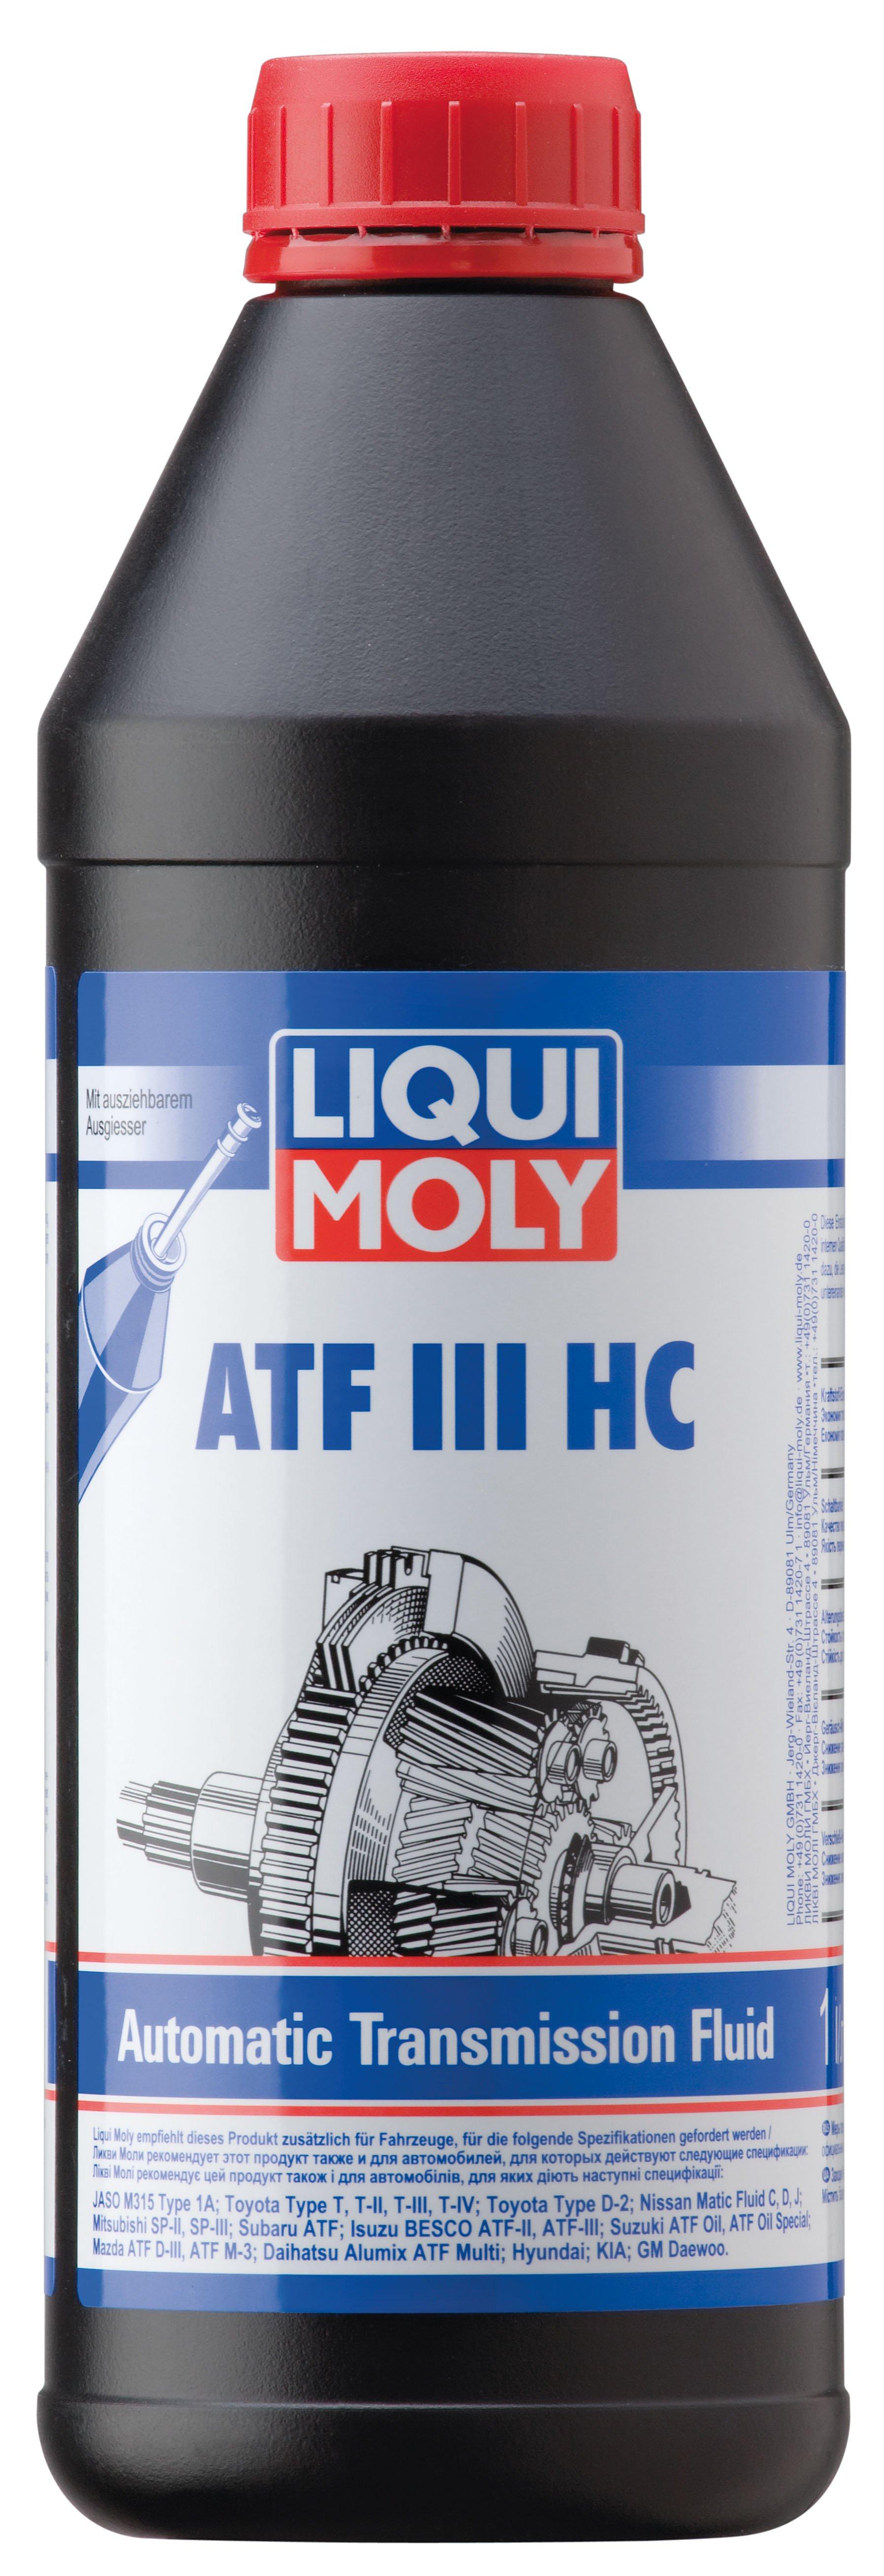 Liqui Moly ATF III HC